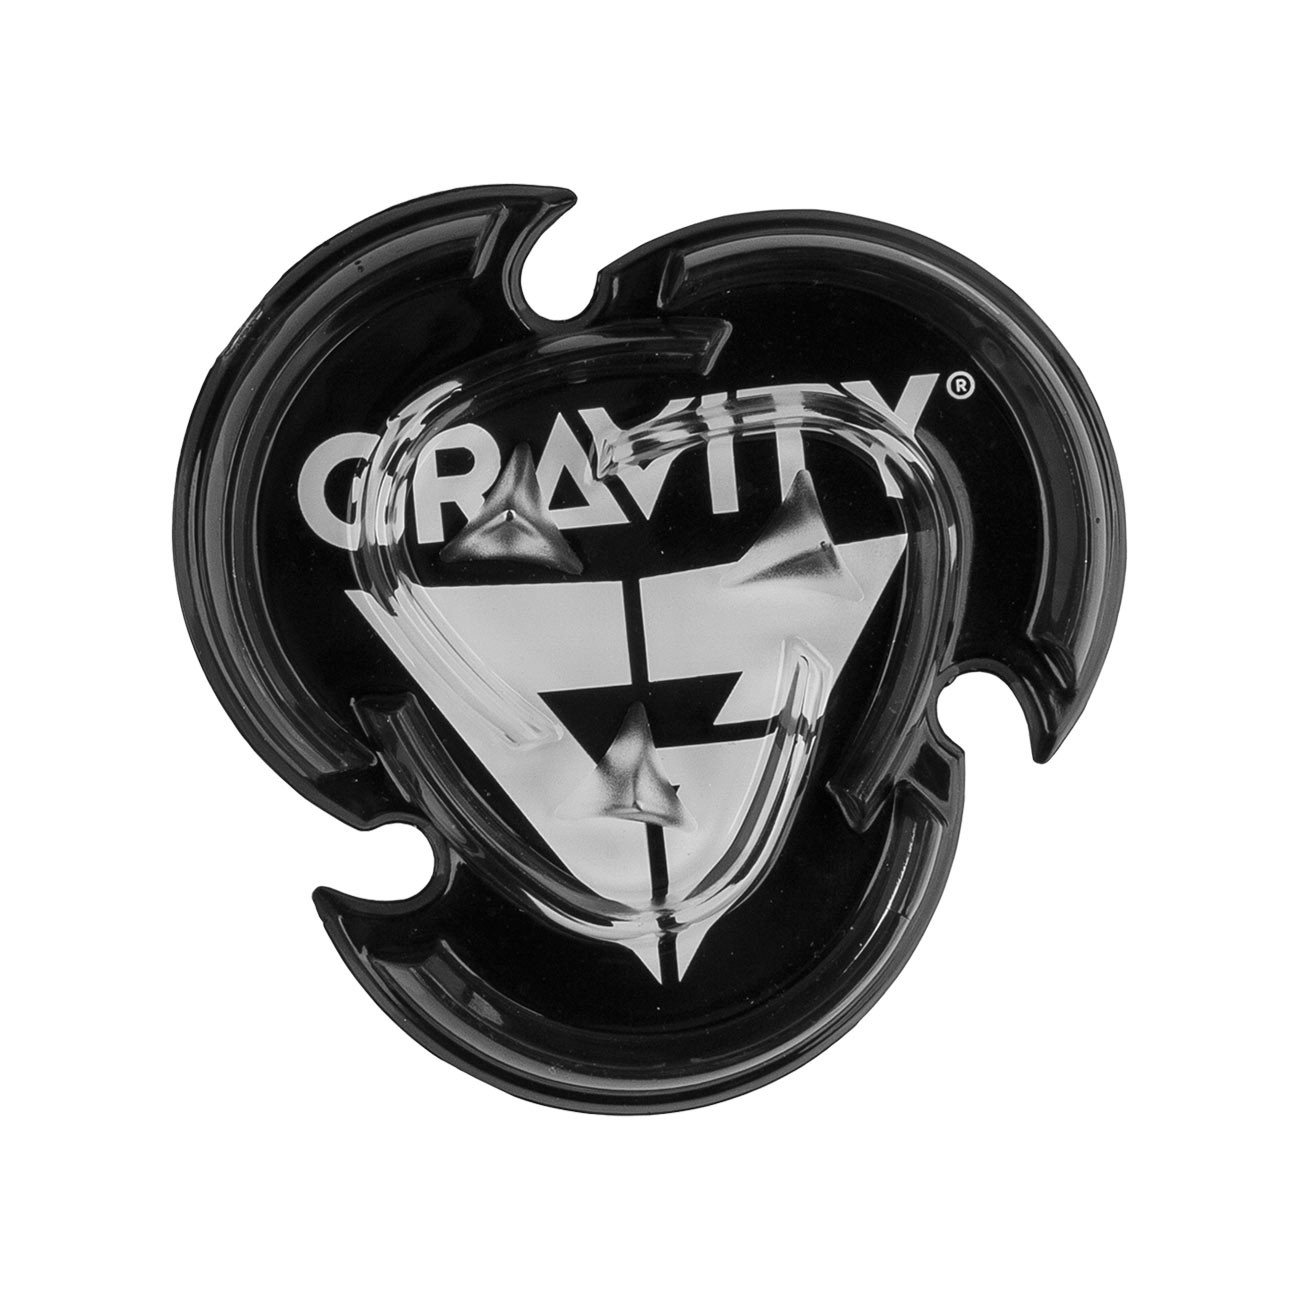 Grip Gravity Icon Mat black